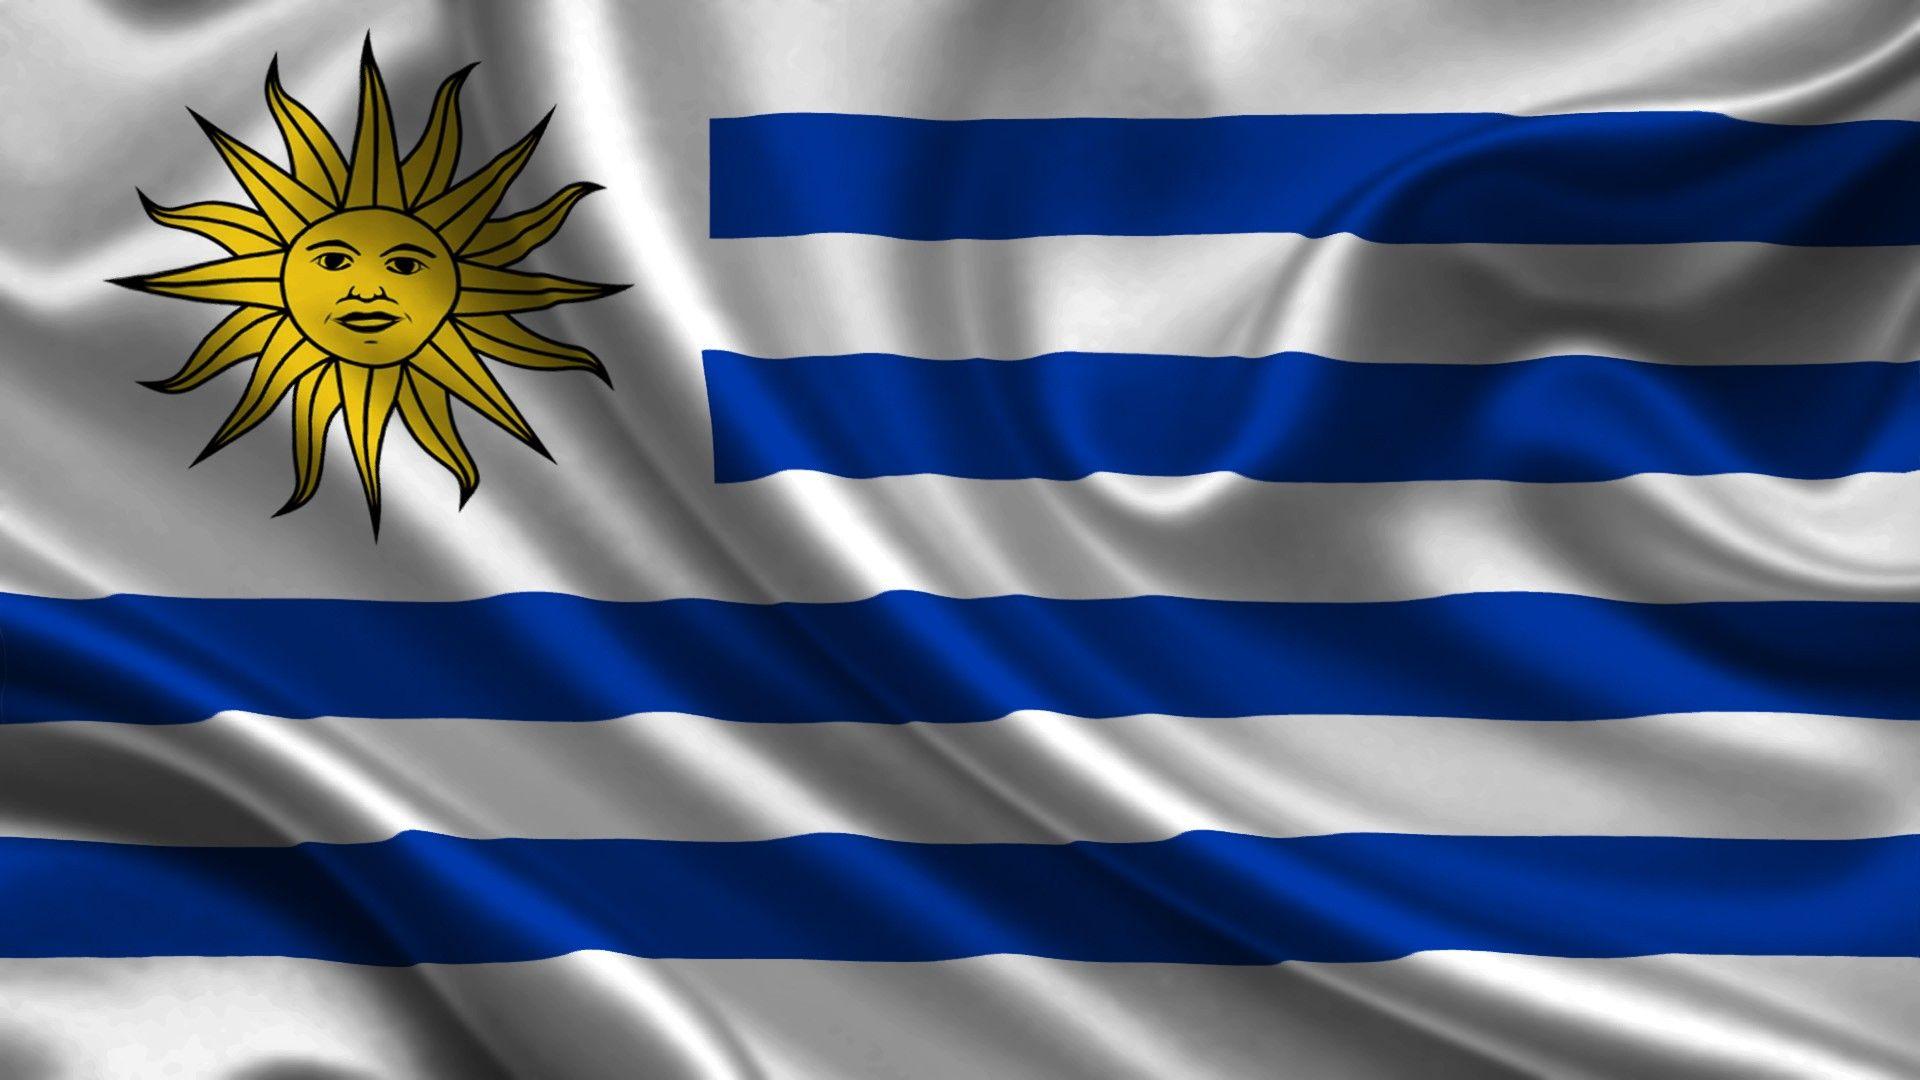 Flag of Uruguay wallpaper Flags wallpaper Uruguay flag 1920x1080